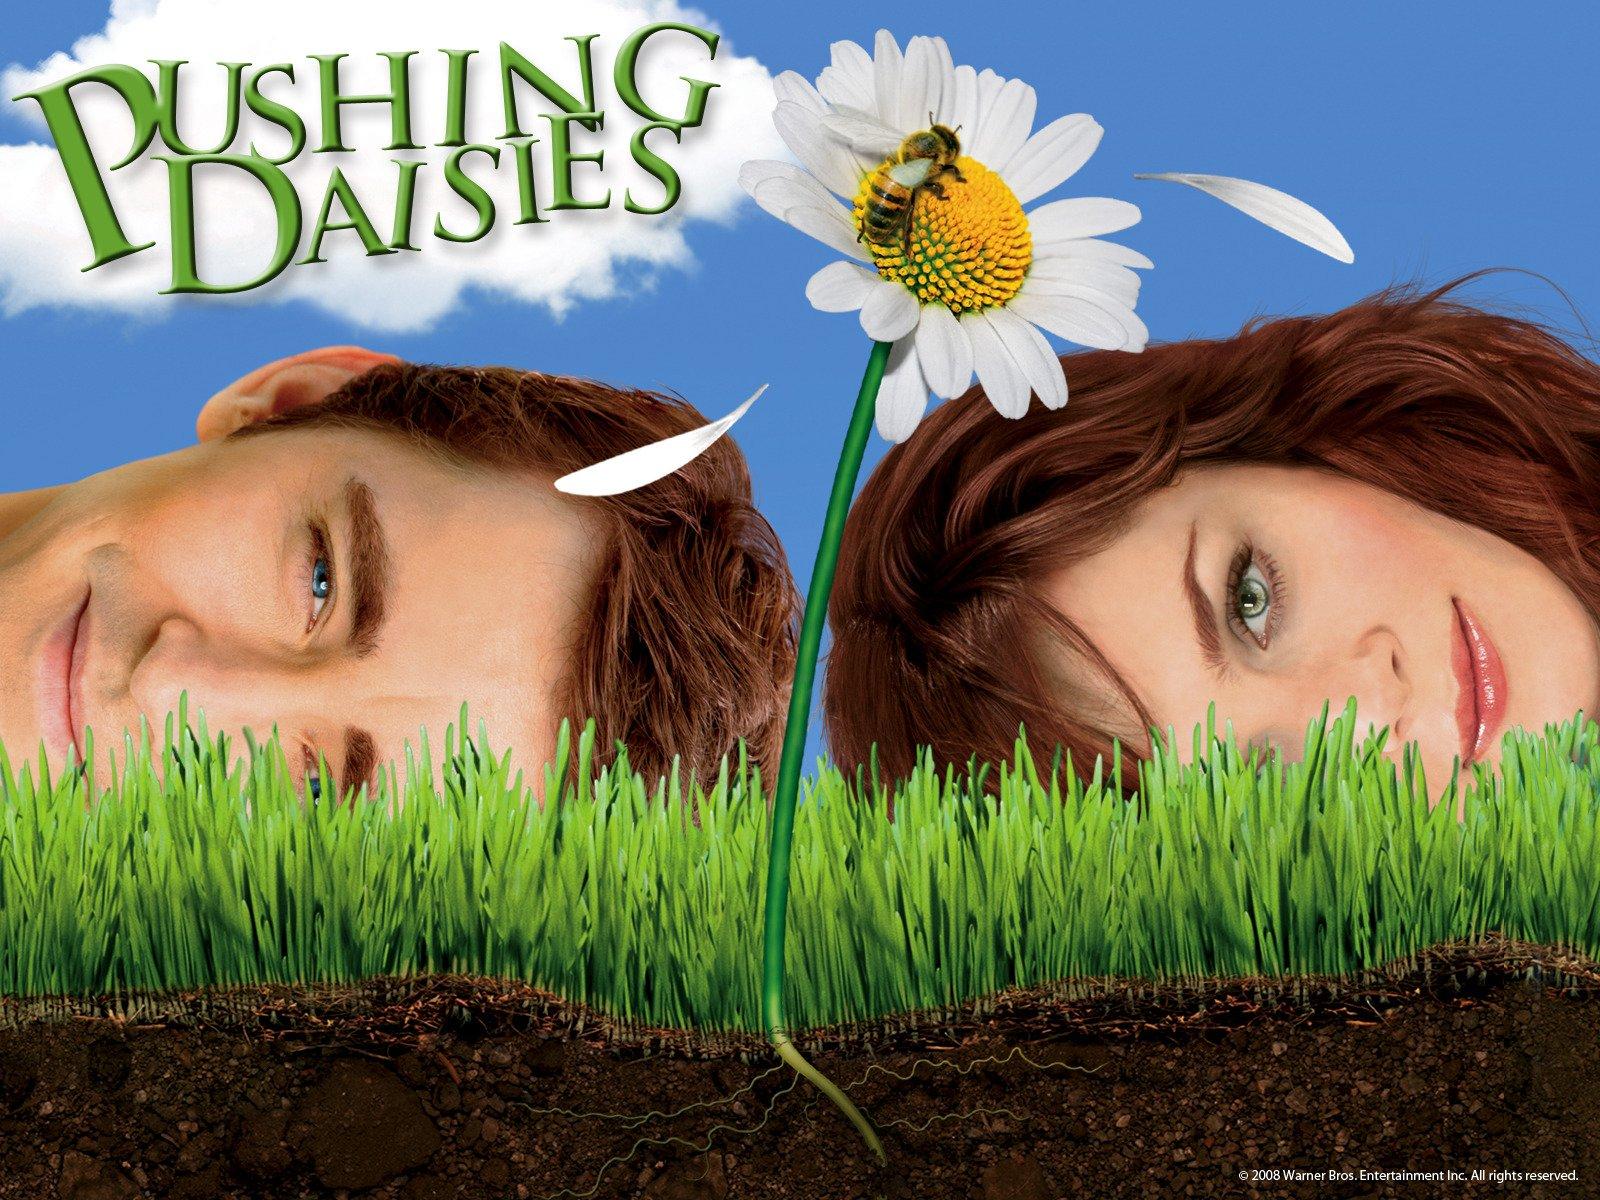 cd80041a3a60 Amazon.co.uk  Watch Pushing Daisies Season 1